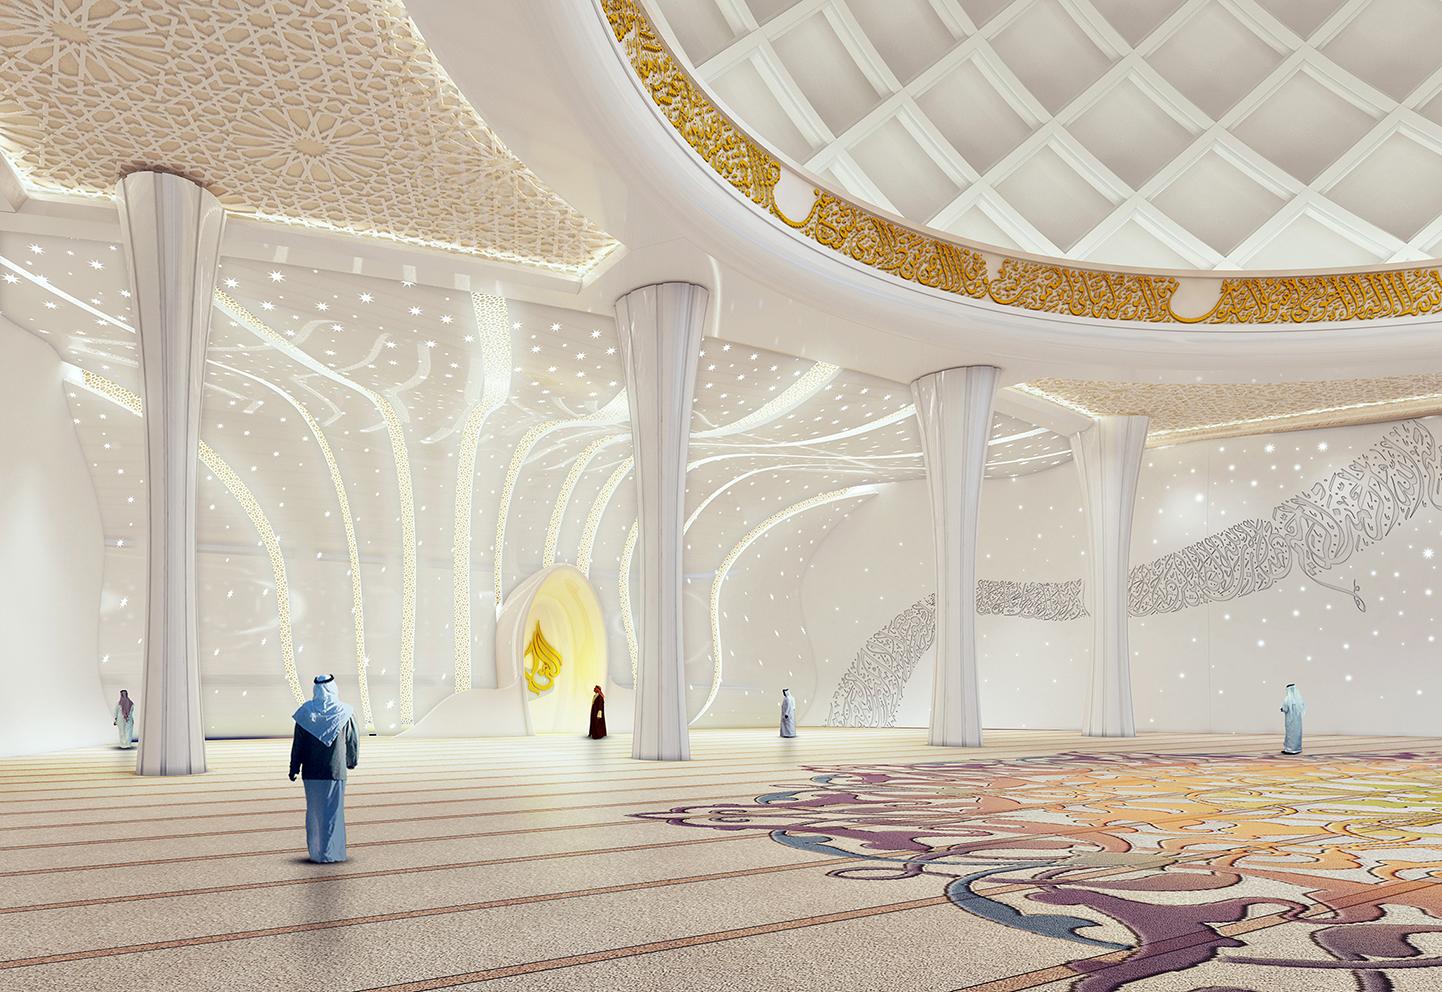 Islamic mosque interior with illumination